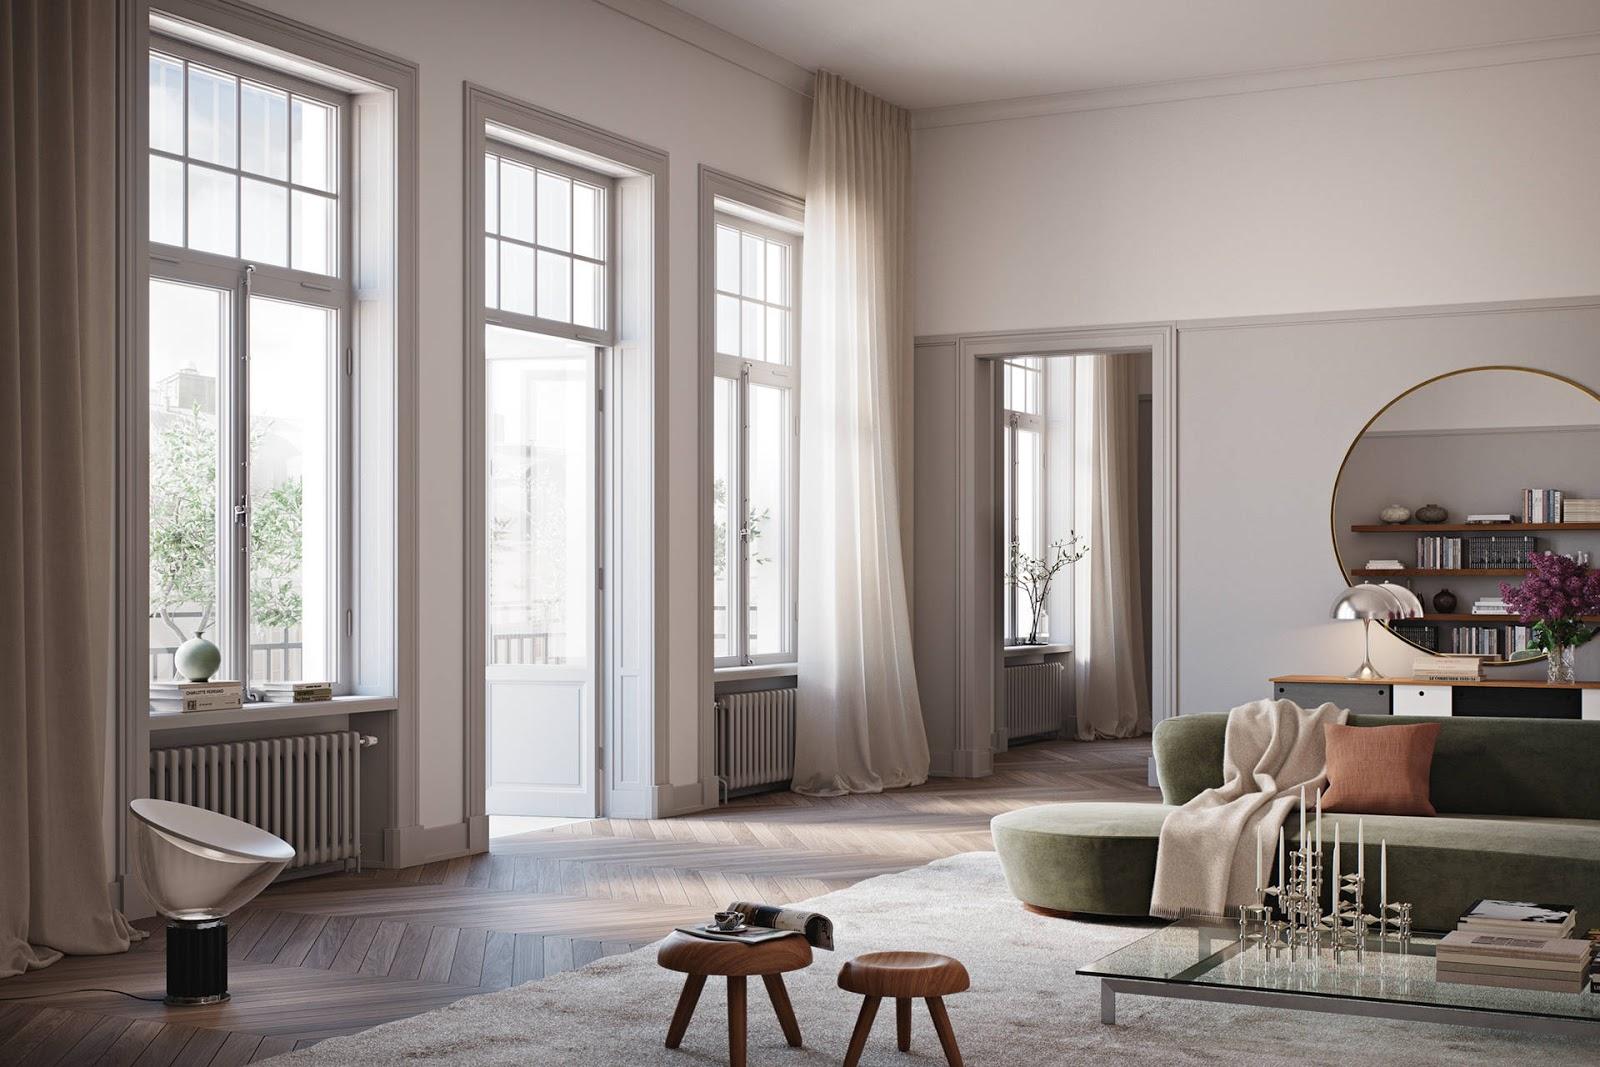 tiny scandinavian apartment, pantone lamp, nagel candlestick, elegant interior design